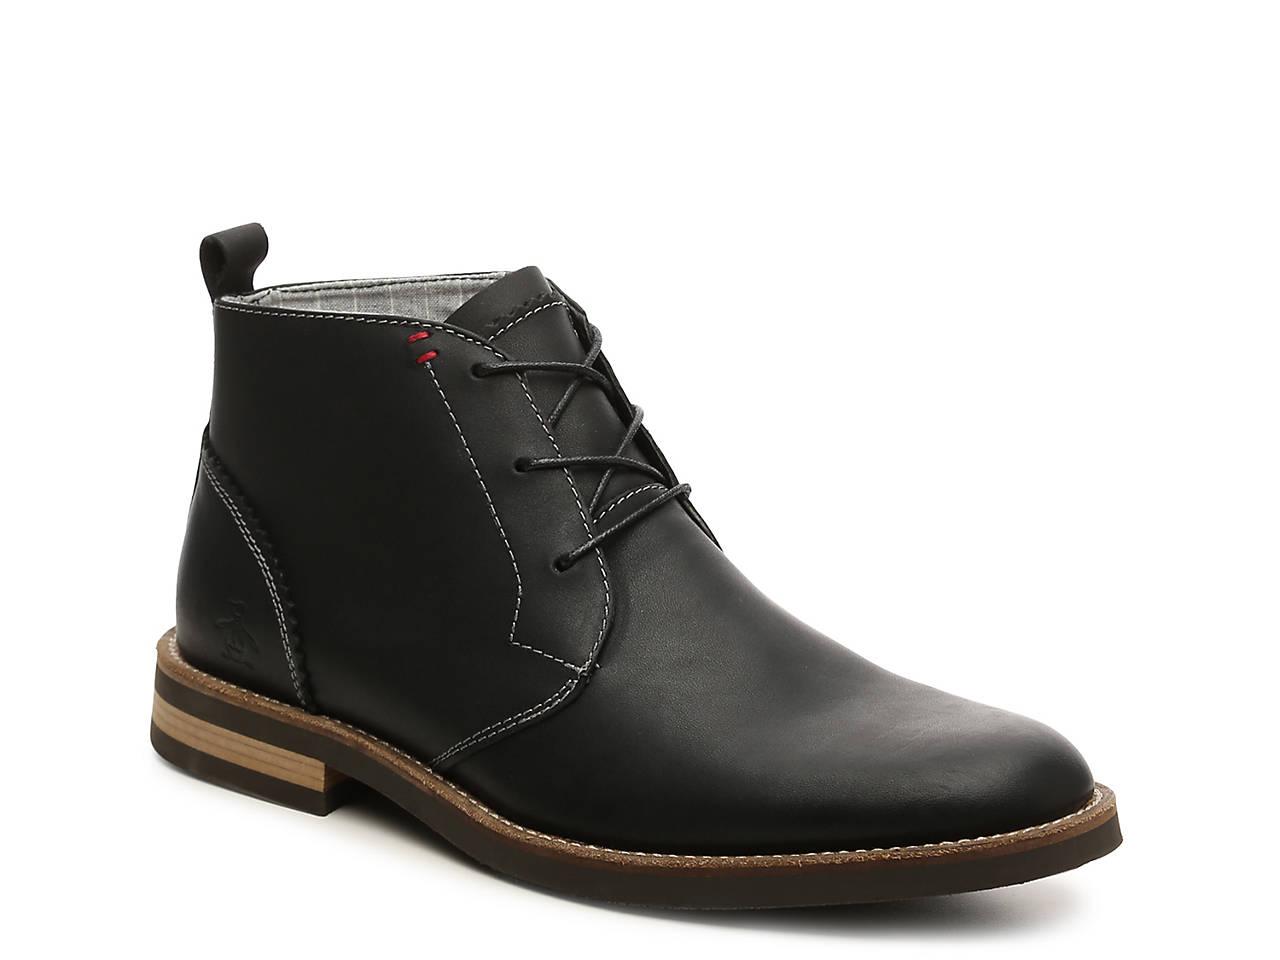 Monty Chukka Boot